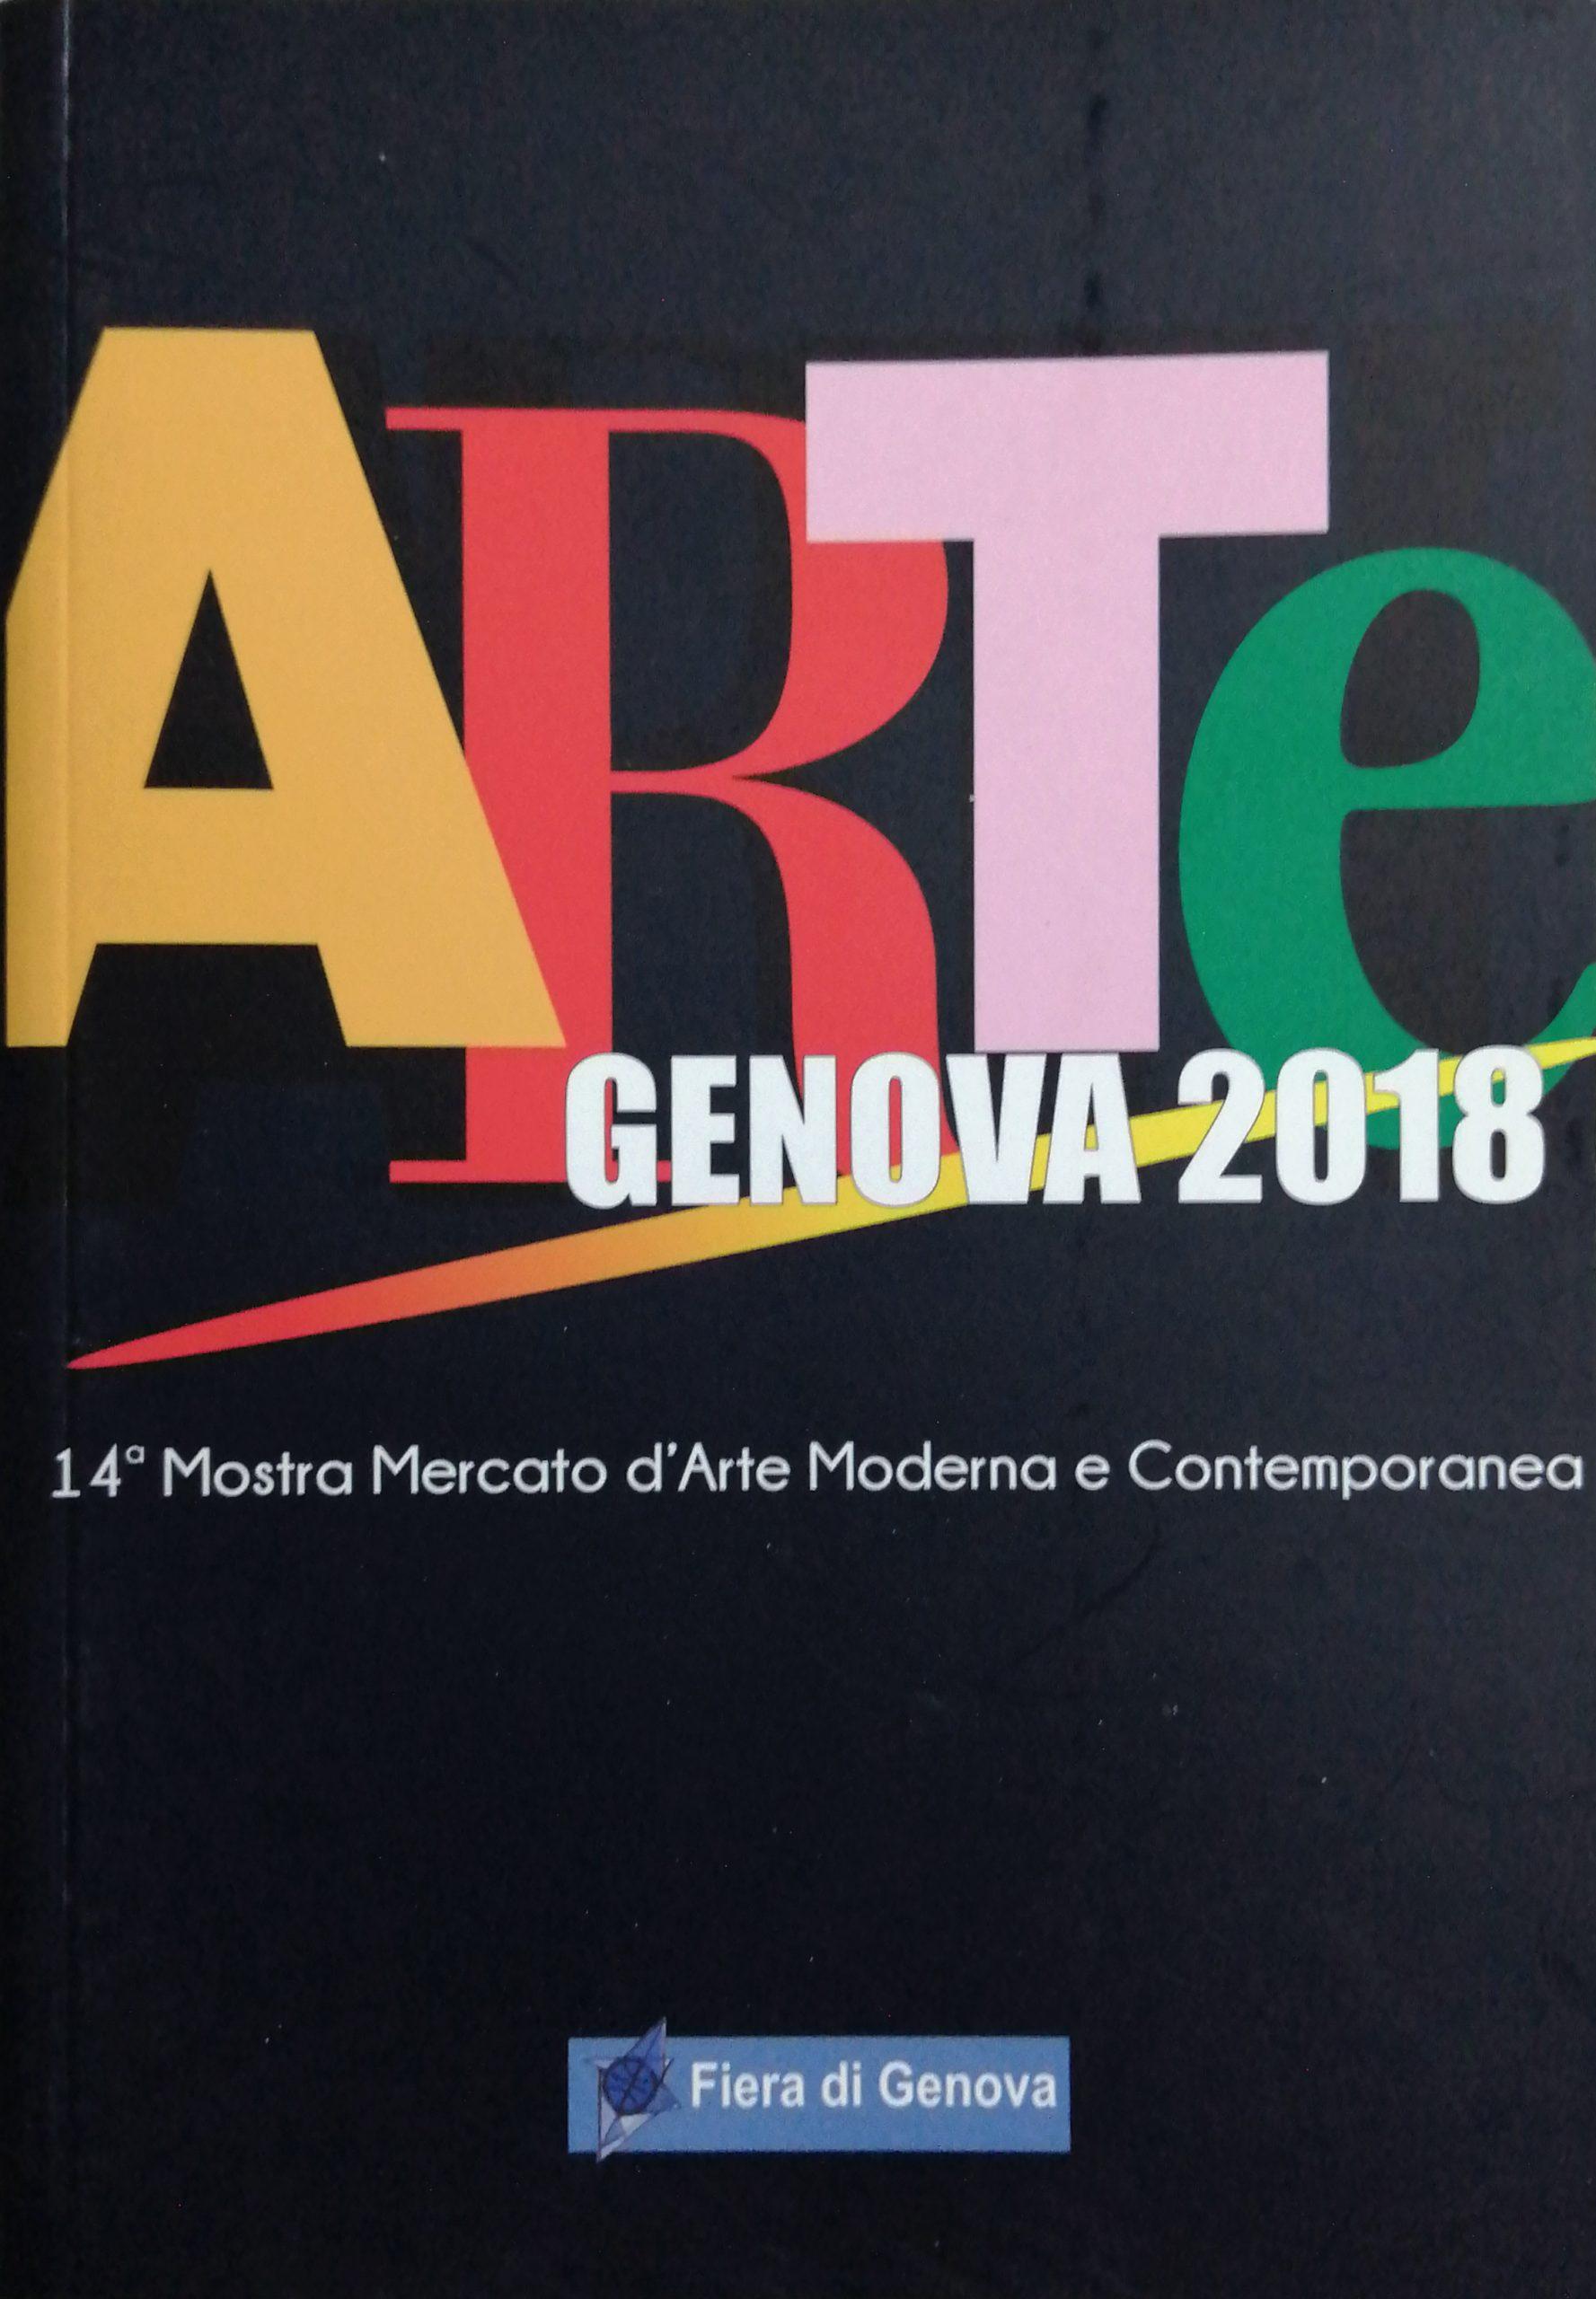 2018 Arte Genova Fiera di Genova scaled - Bibliography/ Catalogues